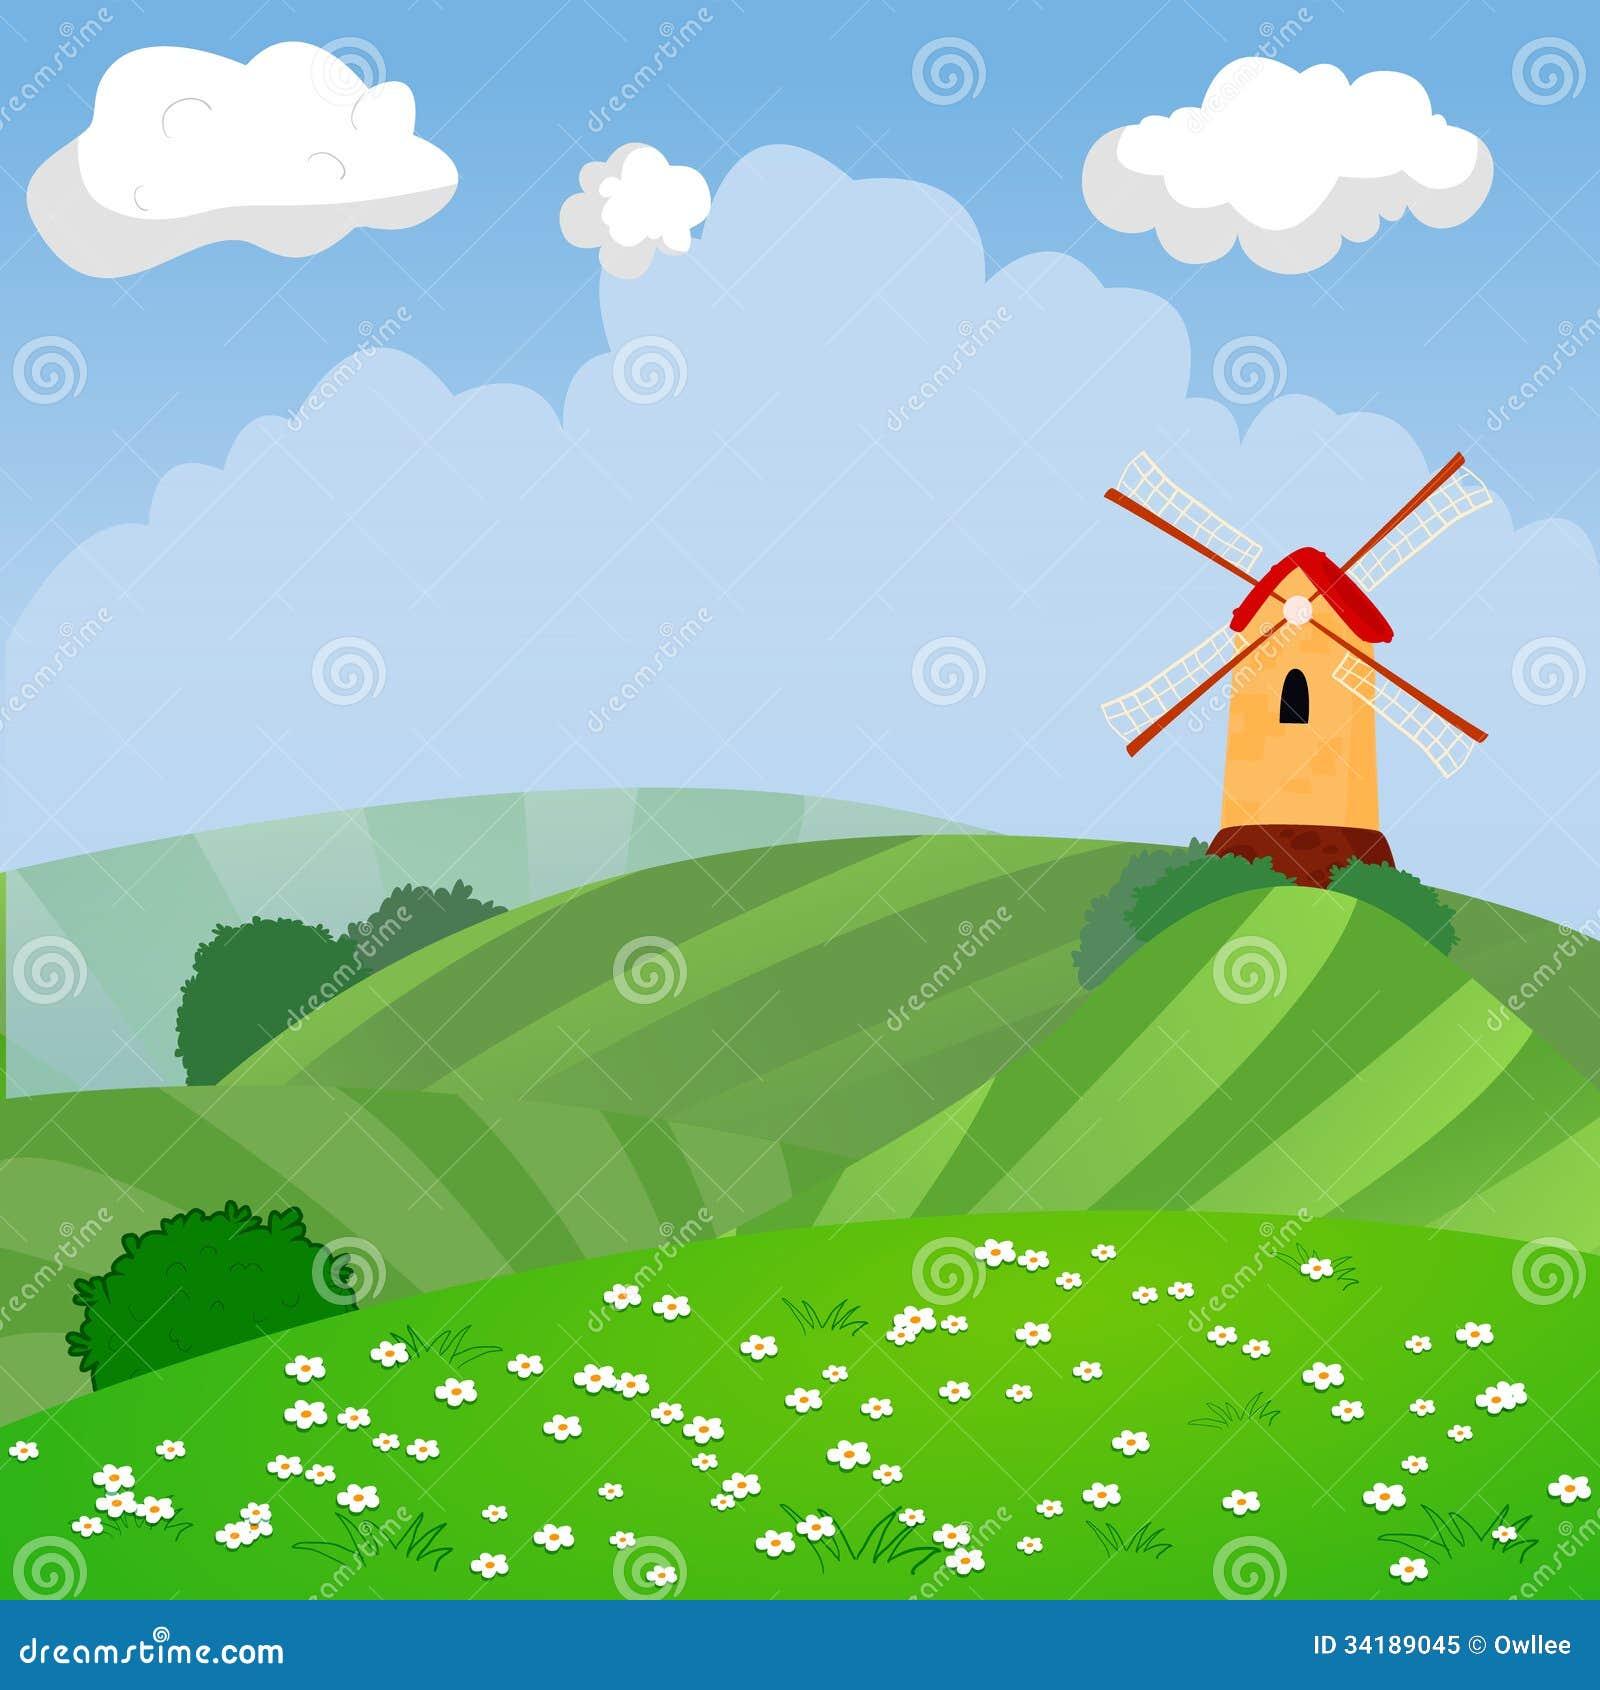 Cute Cartoon Vector Farm Landscape Royalty Free Stock